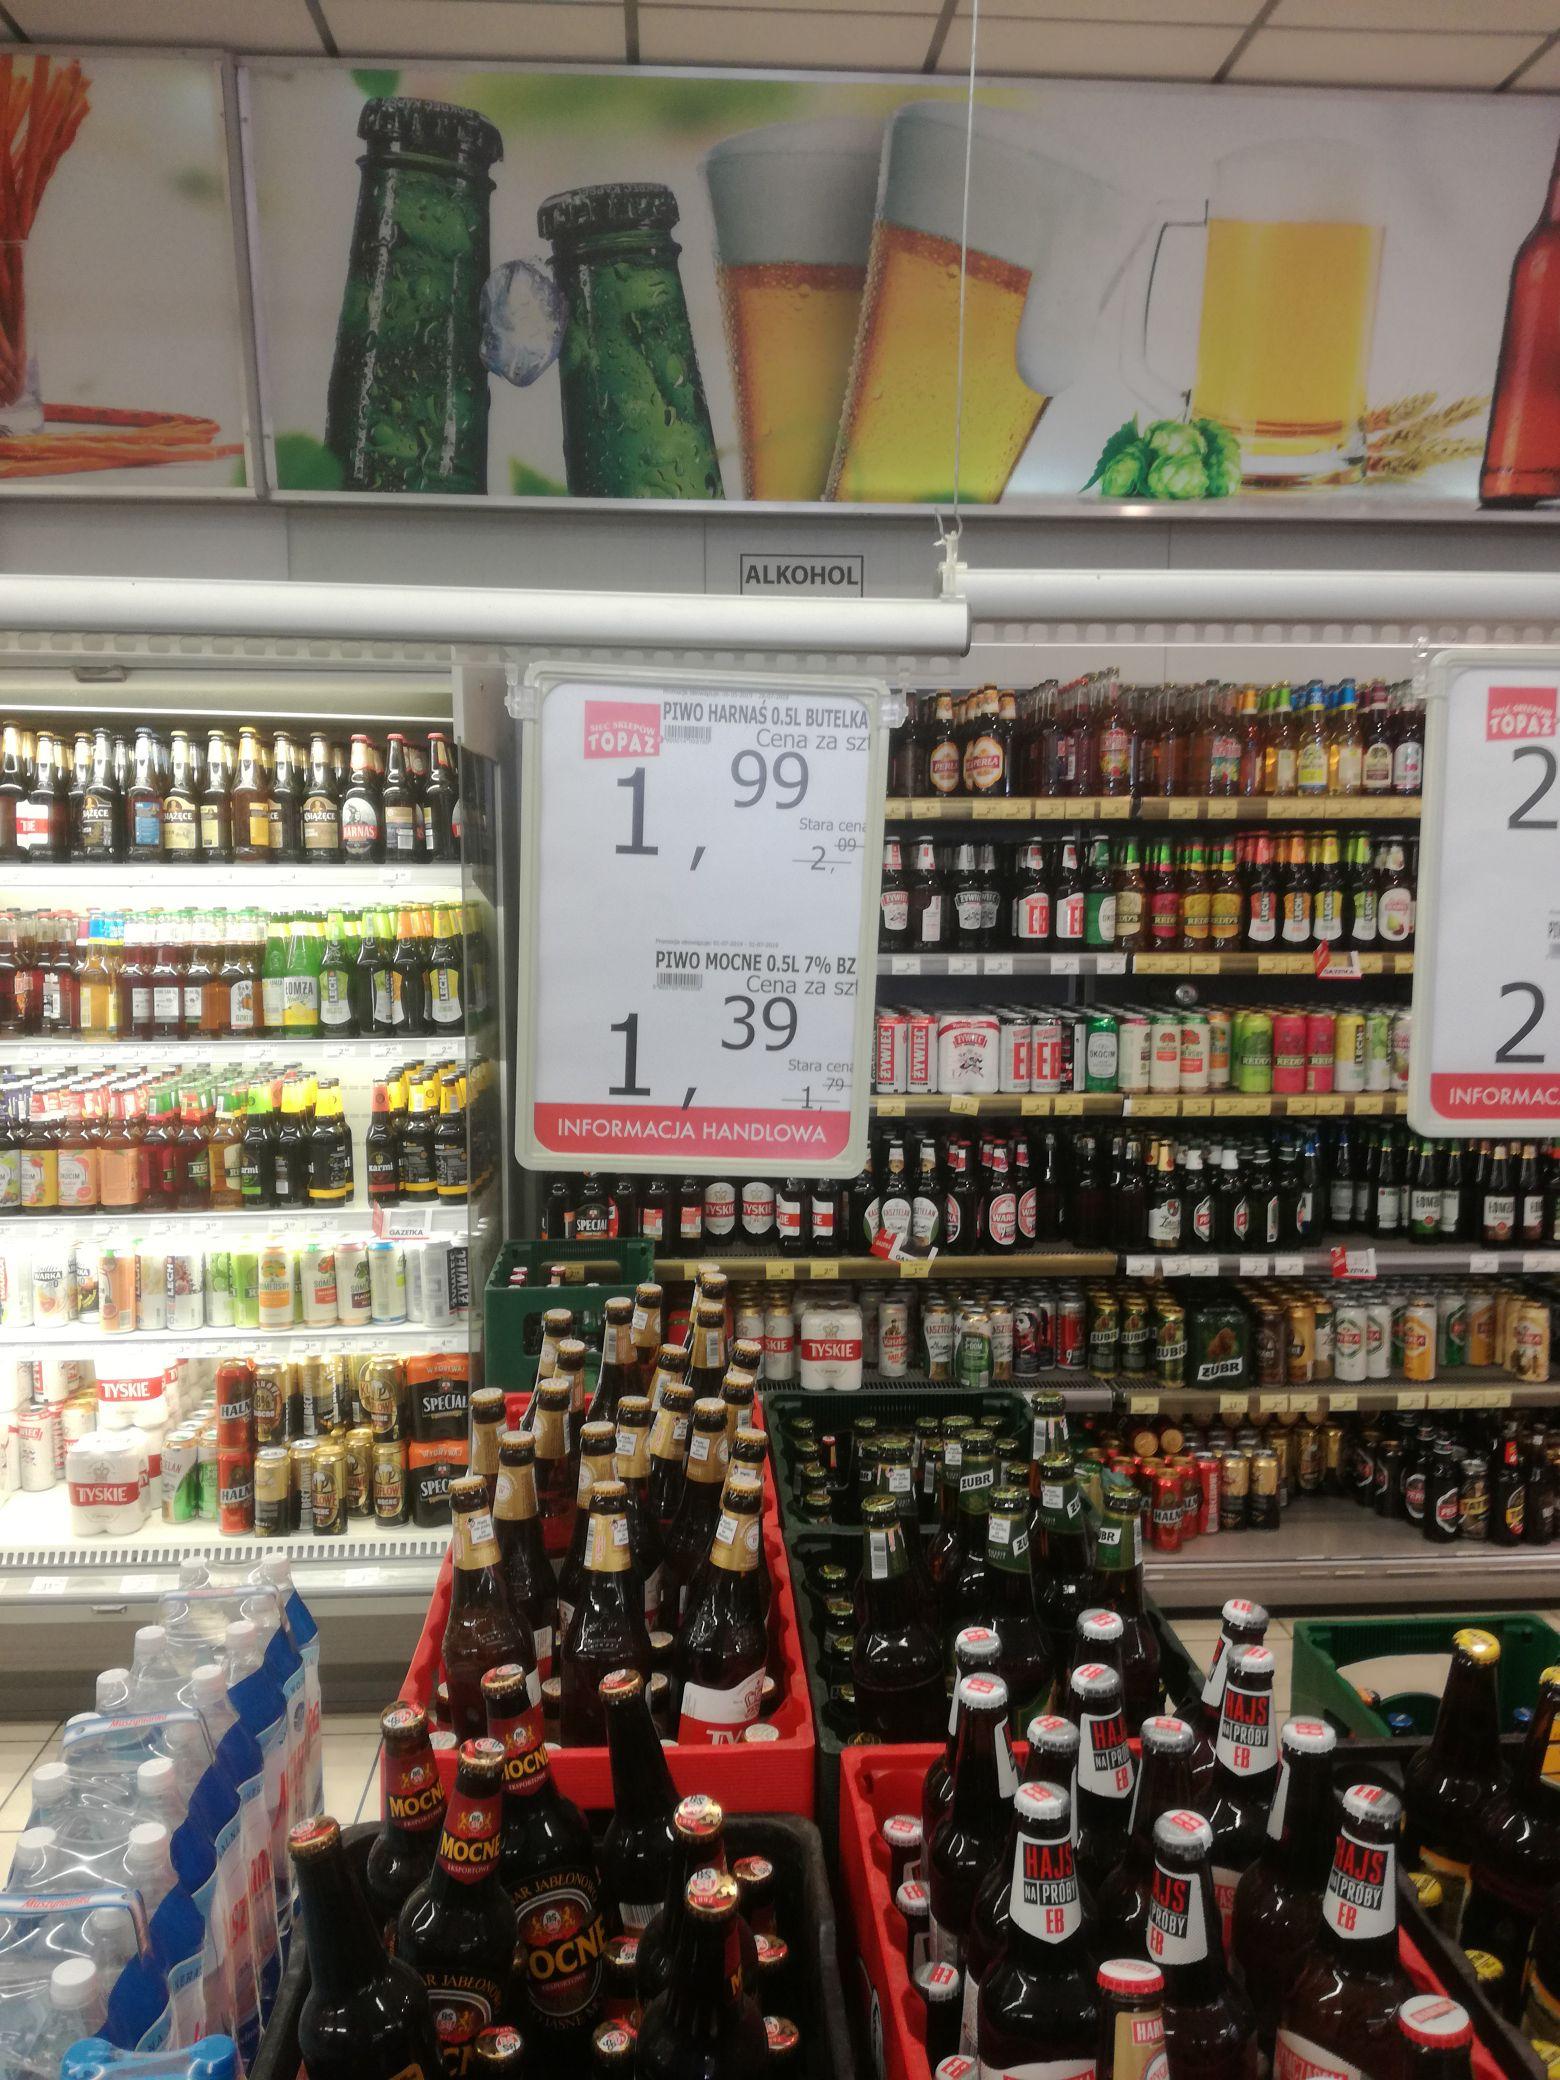 Browar Jabłonowo Piwo mocne 7.2%, butelka 0.5 l